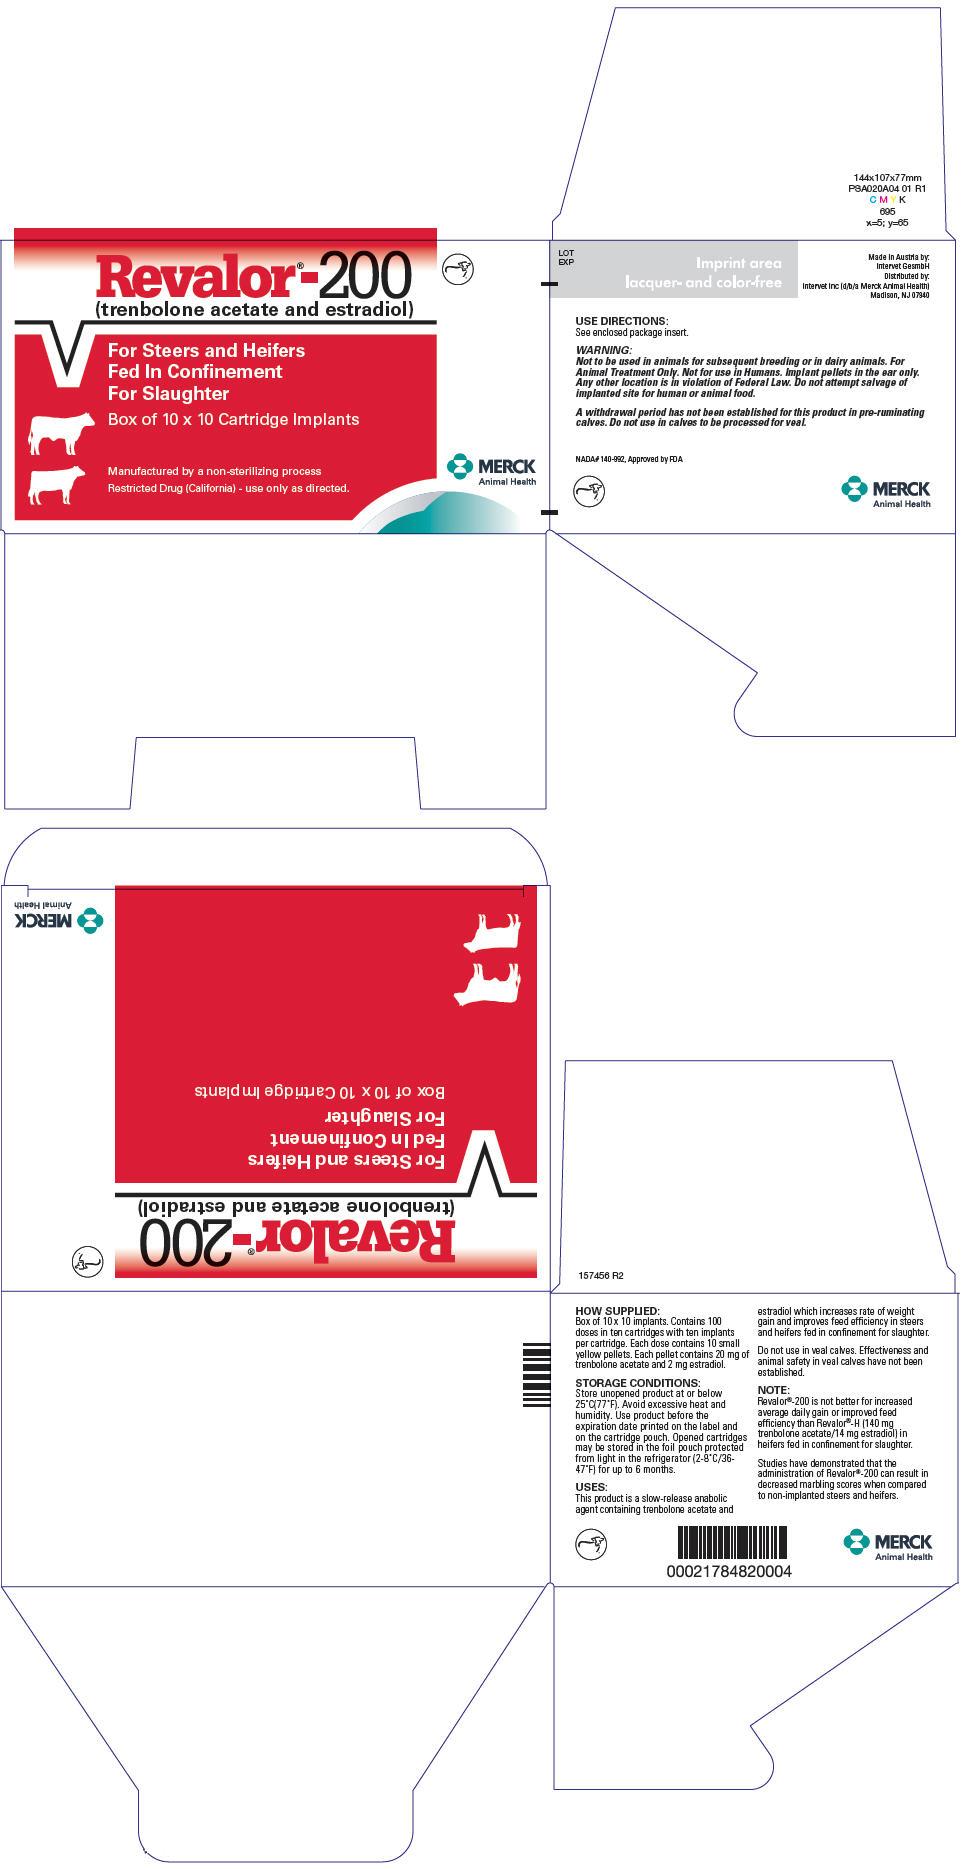 Revalor-200 (Trenbolone Acetate And Estradiol) Implant [Merck Sharp & Dohme Corp.]